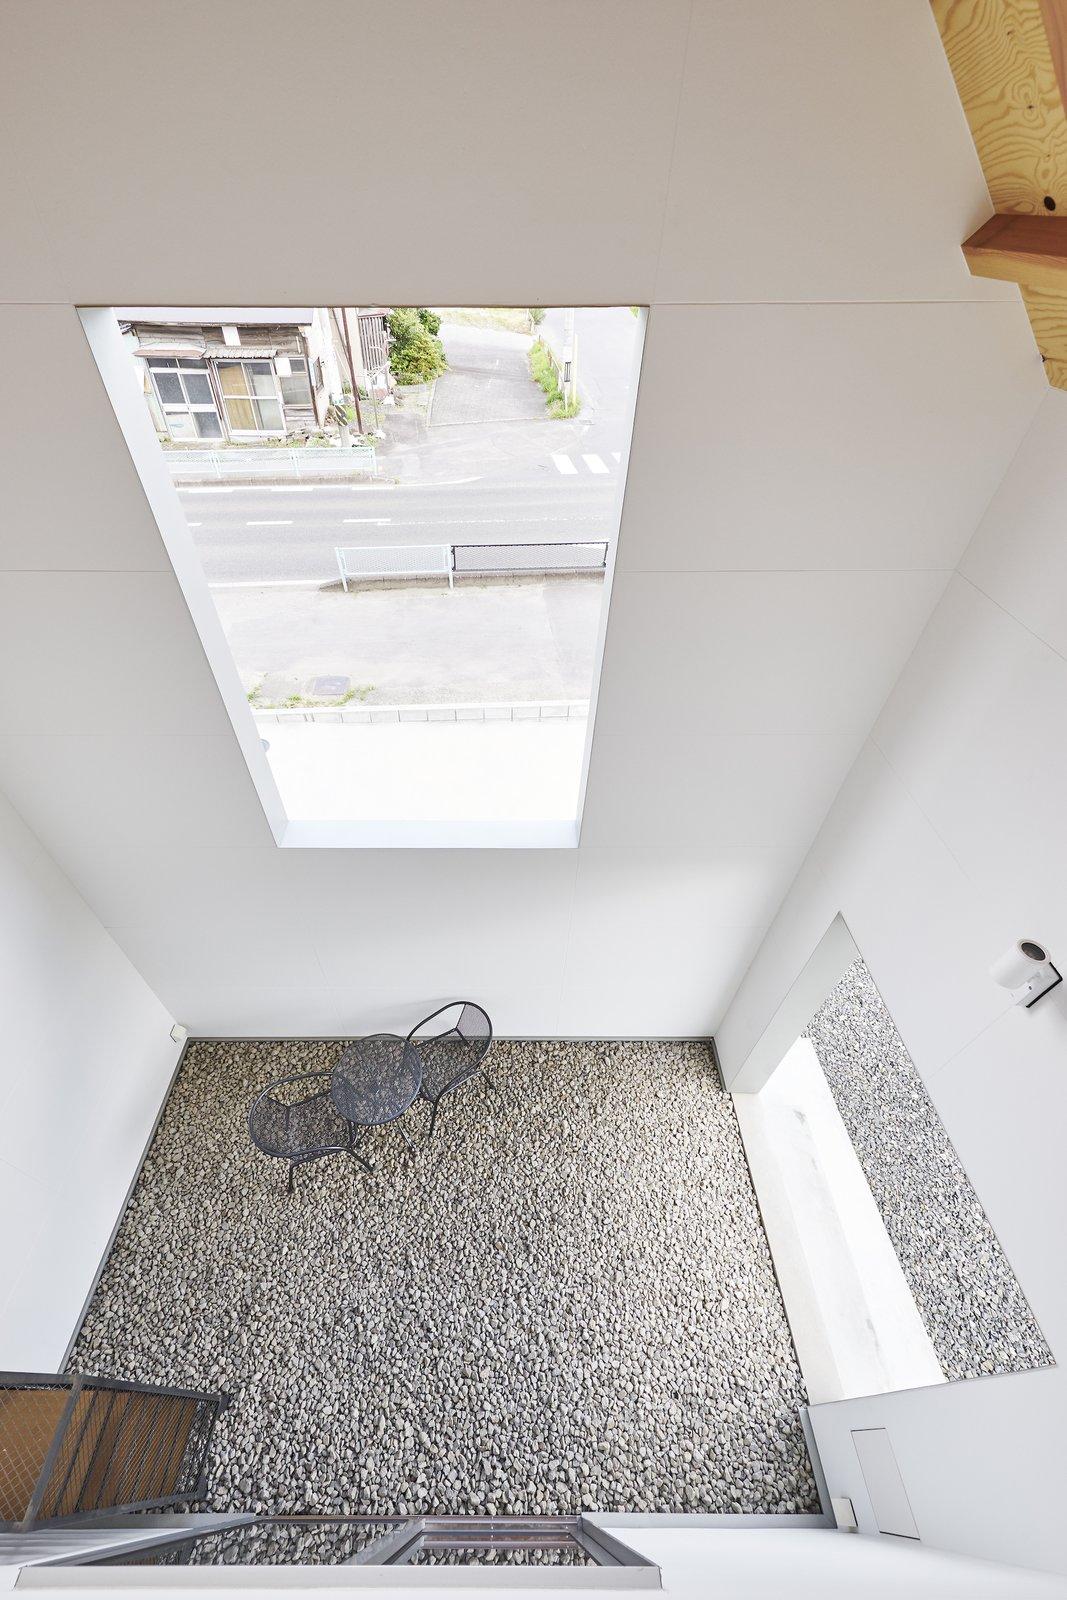 Photo 5 of 9 in House in Suwamachi by Kazuya Saito Architects